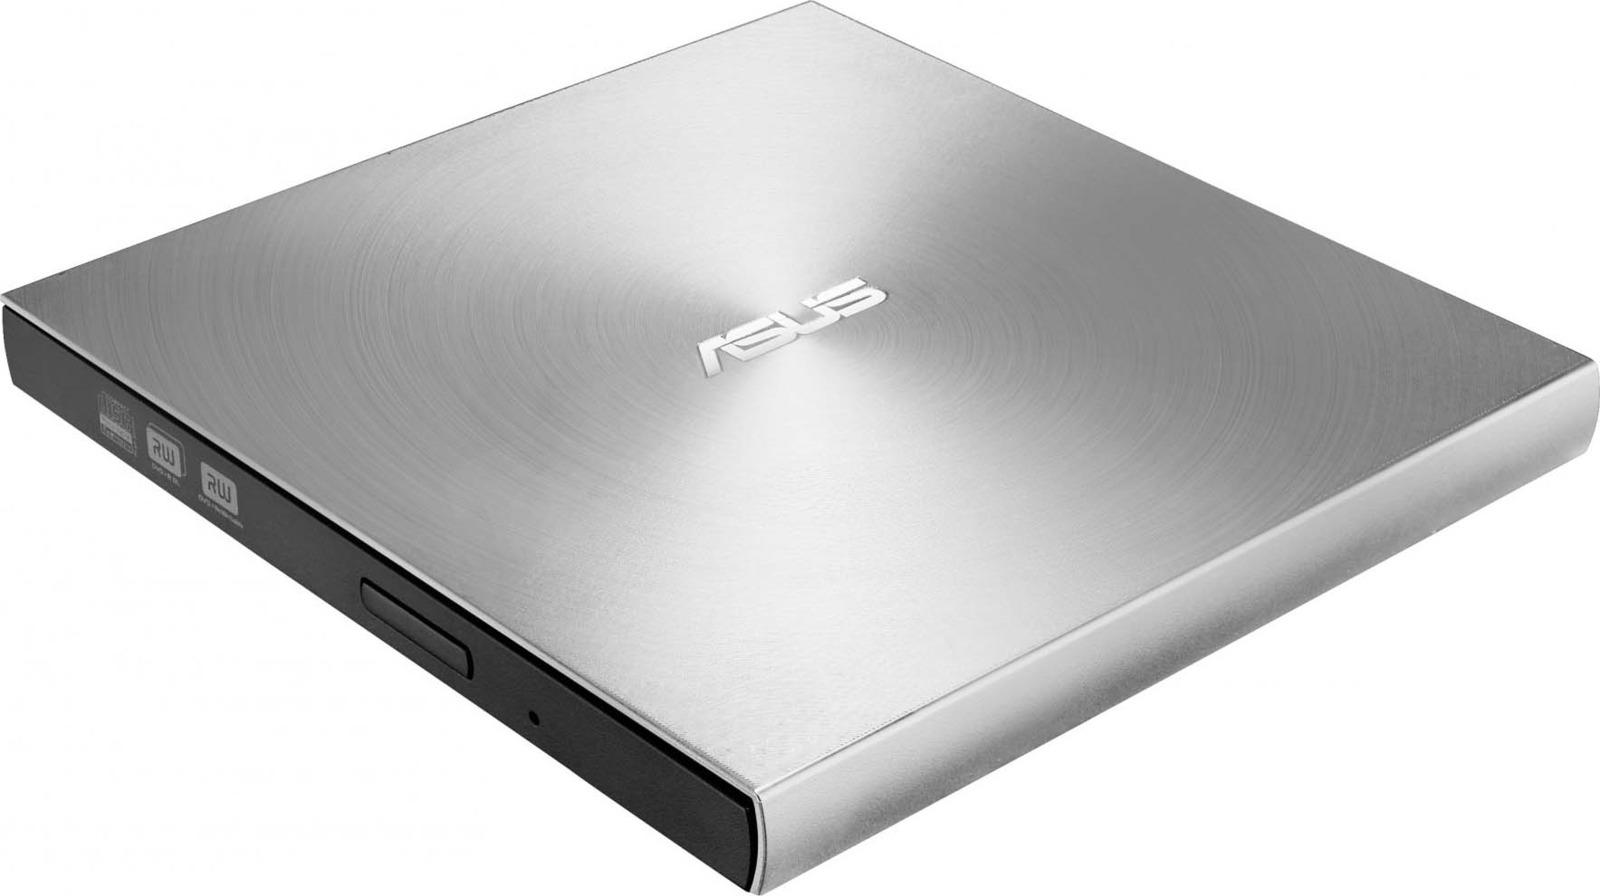 Привод DVD-RW Asus, SDRW-08U7M-U/SIL/G/AS, серебристый все цены